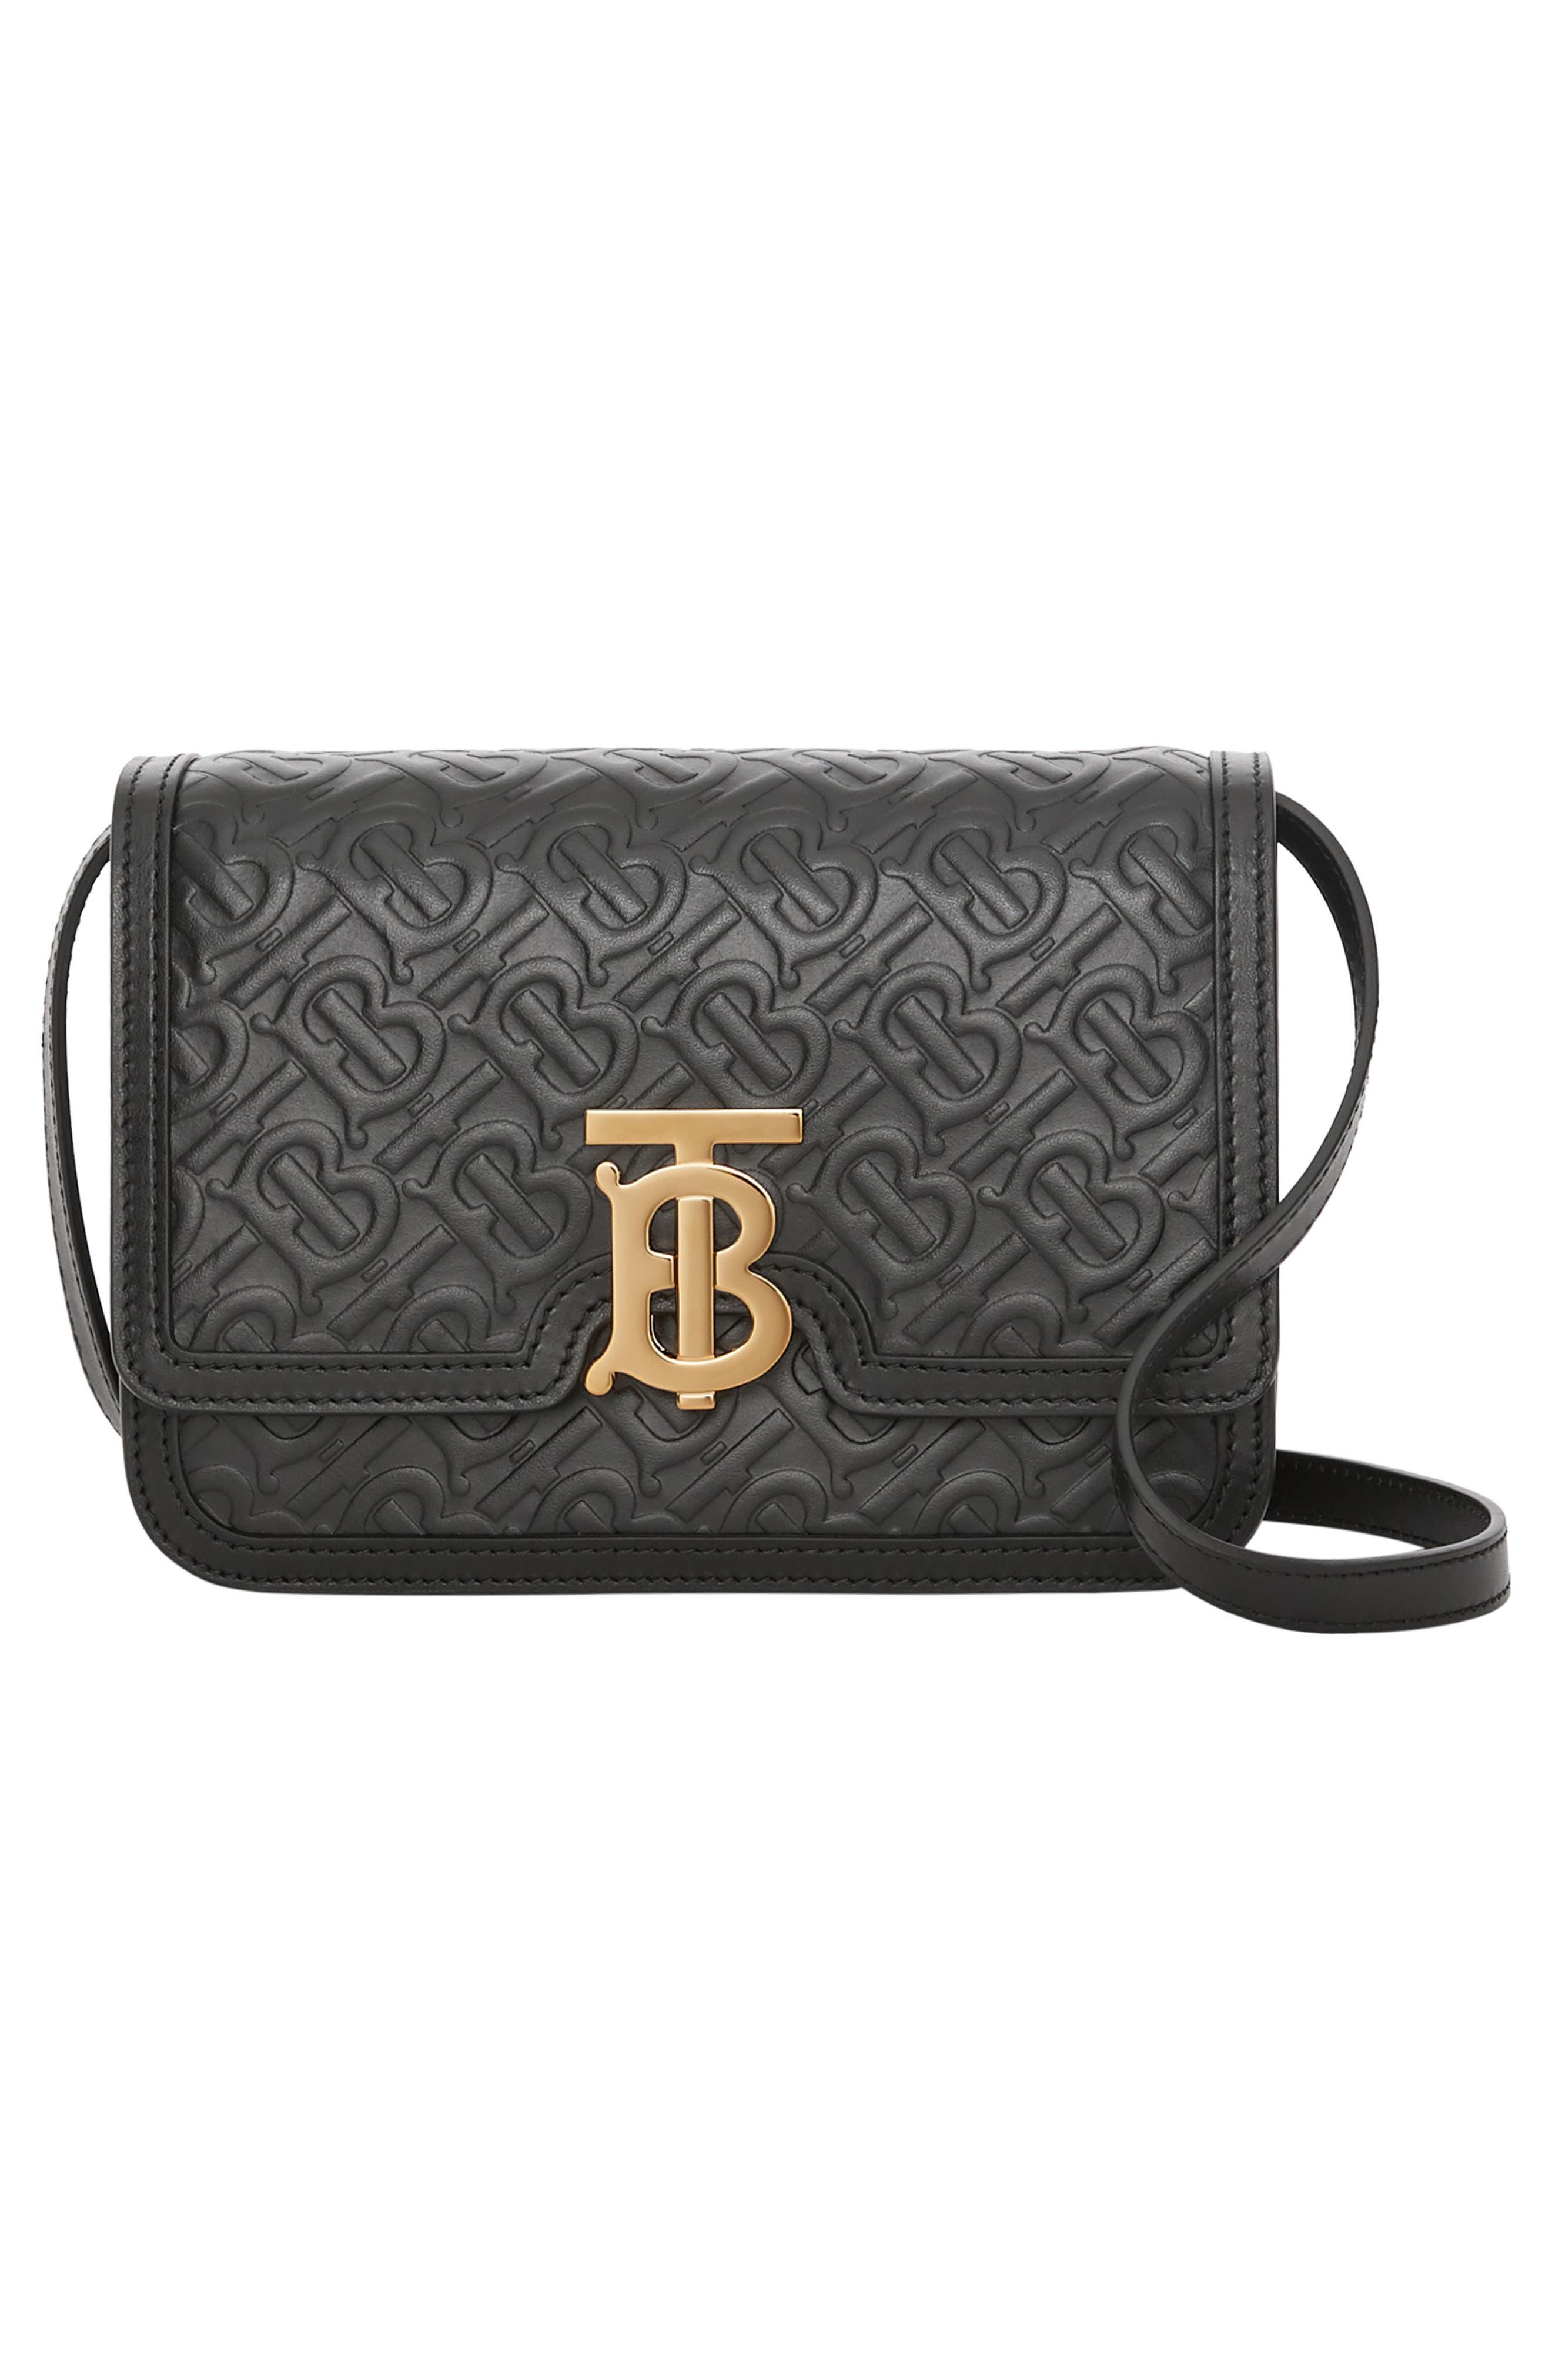 BURBERRY,                             Small Monogram Leather TB Bag,                             Alternate thumbnail 6, color,                             BLACK